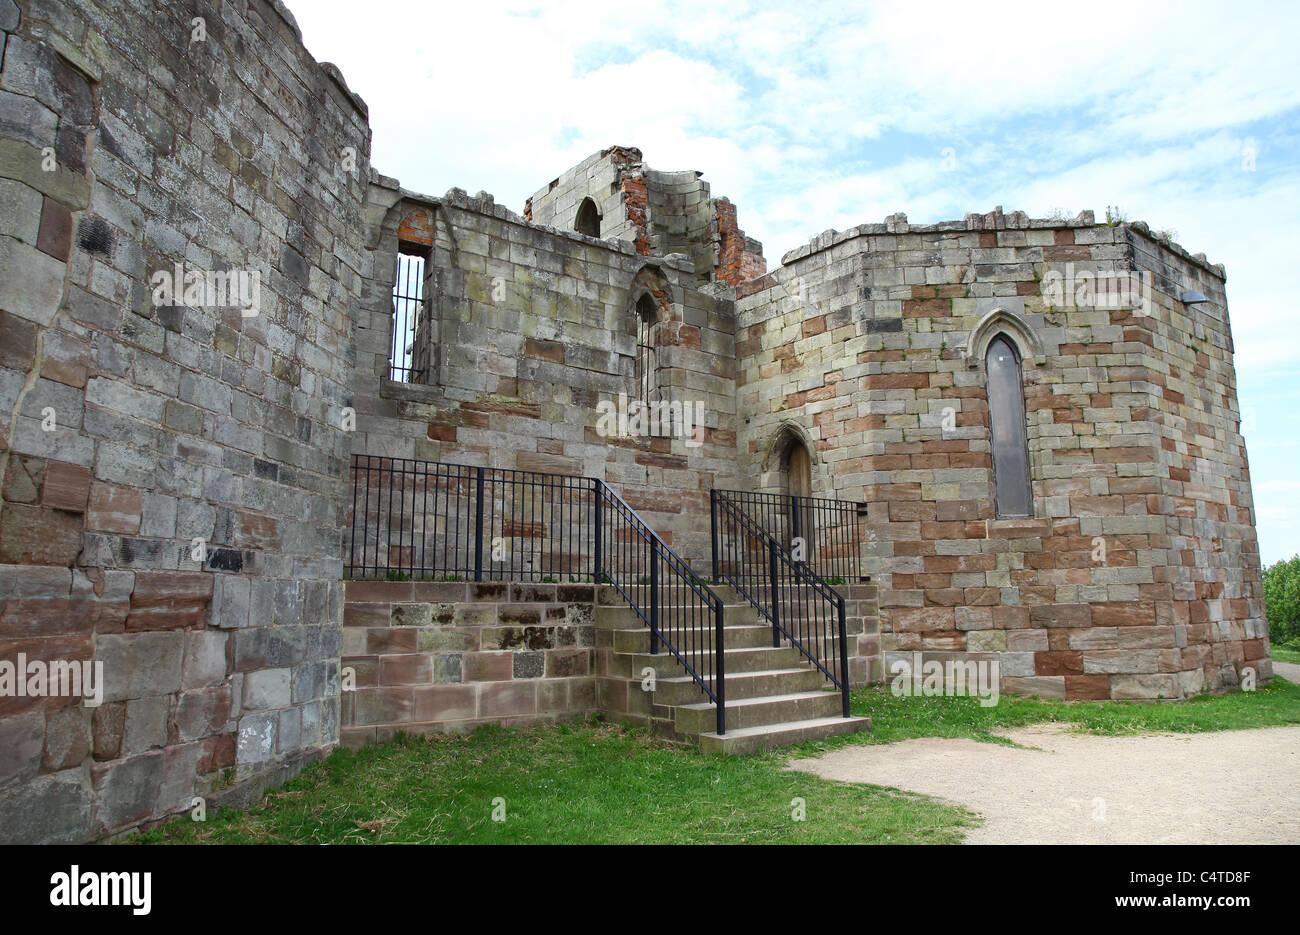 Stafford Castle, Stafford, Staffordshire, West Midlands, England, UK - Stock Image